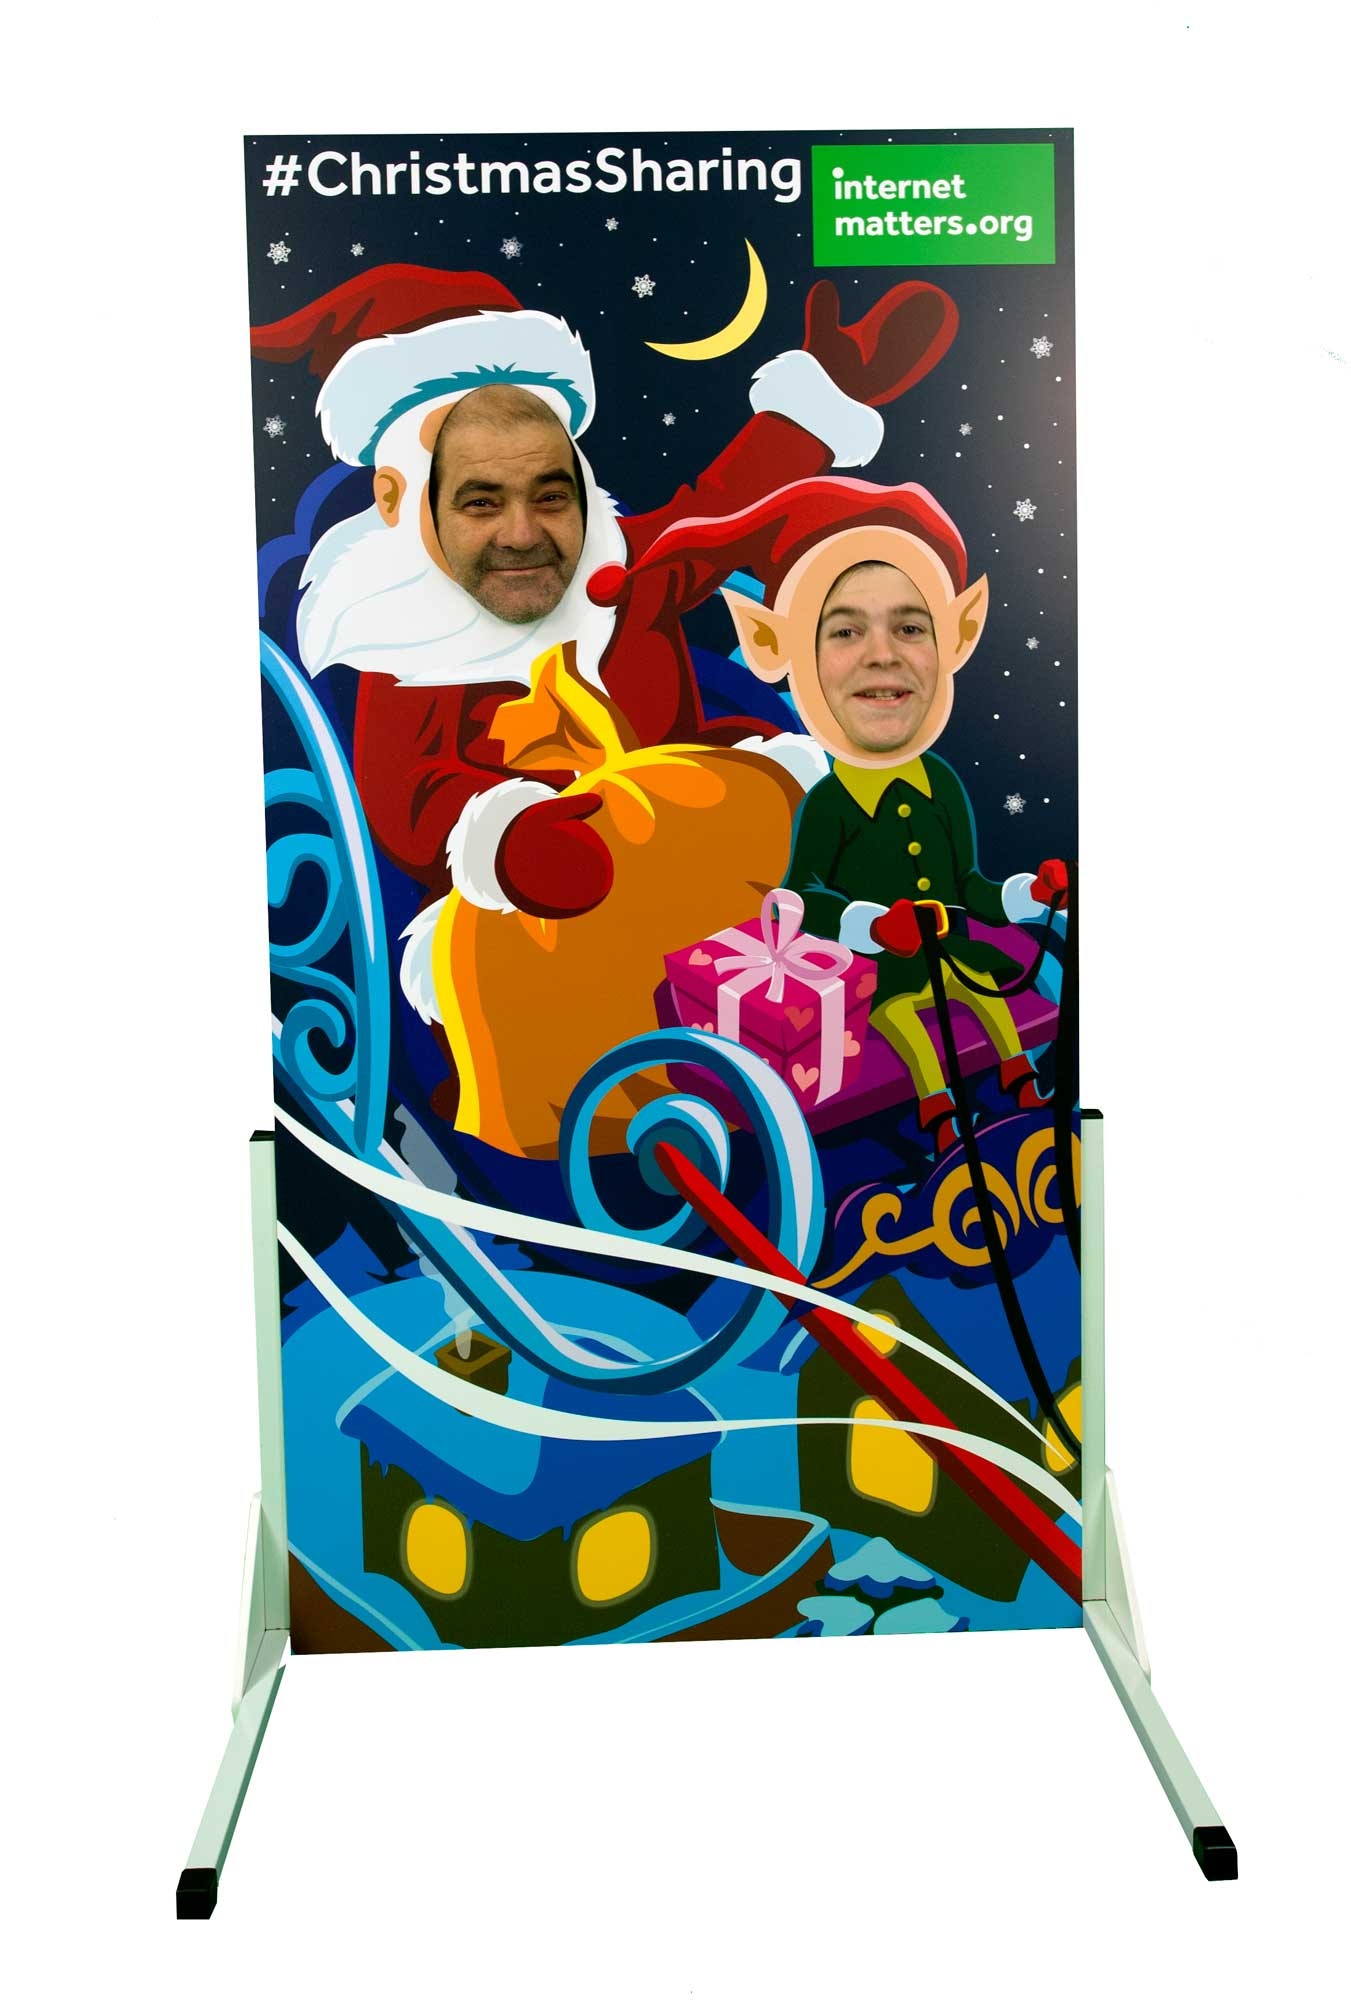 Christmas photo cutout board campaign